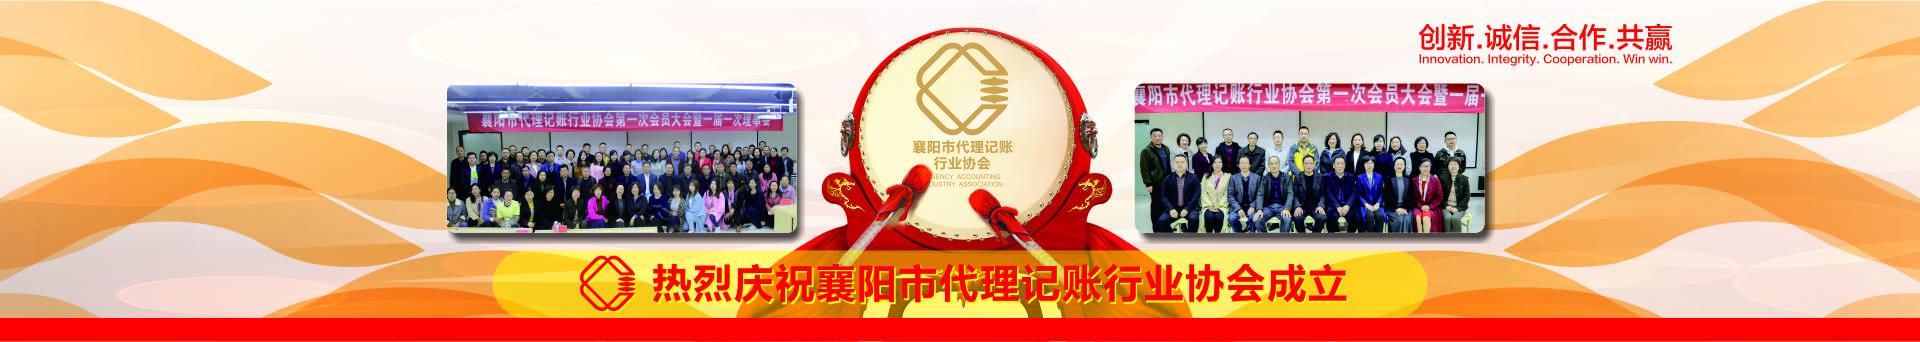 PC-首頁banner2